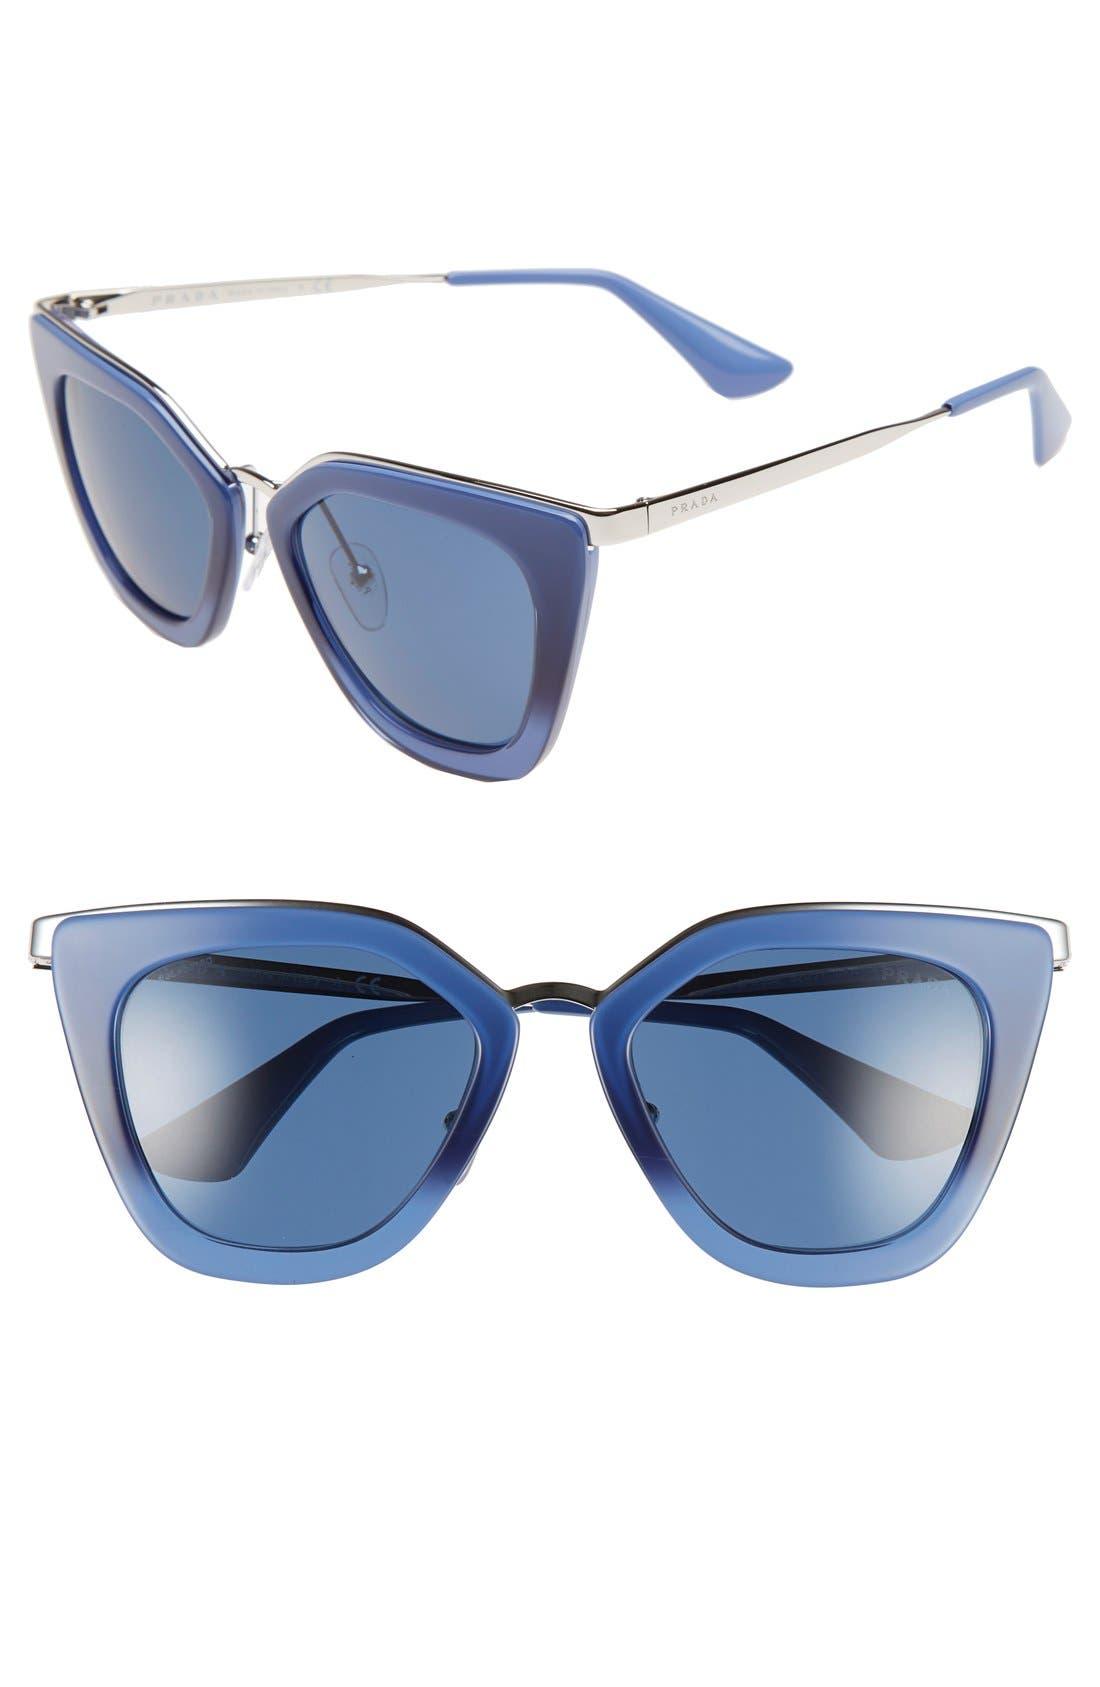 52mm Cat Eye Sunglasses,                             Main thumbnail 5, color,